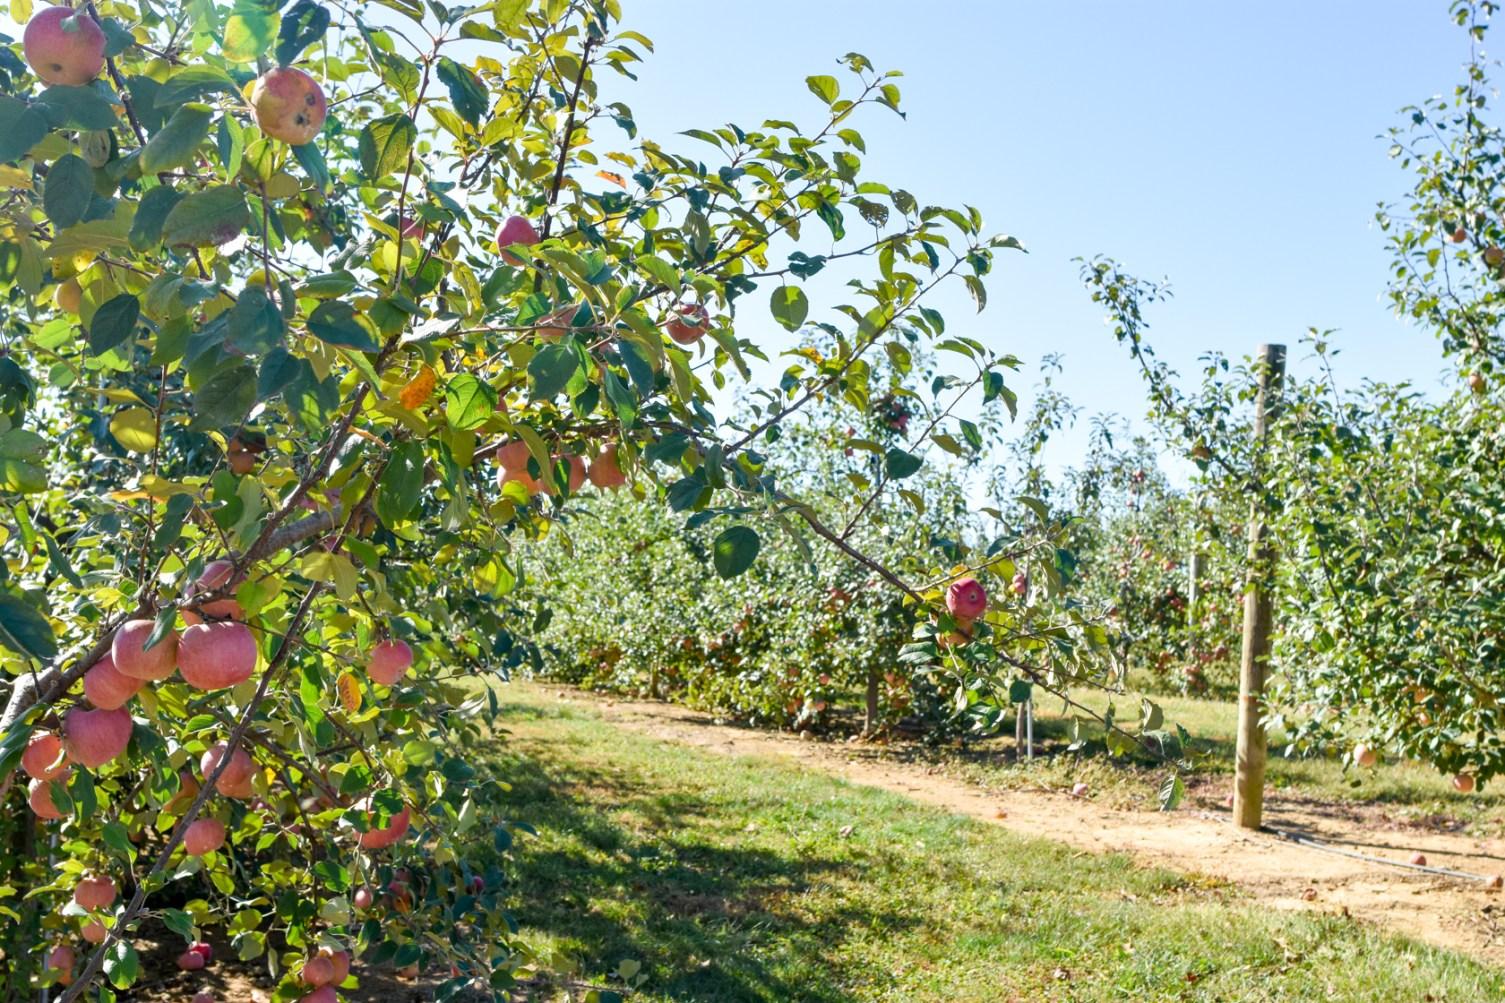 Joe Huber's Family Farm in Indiana